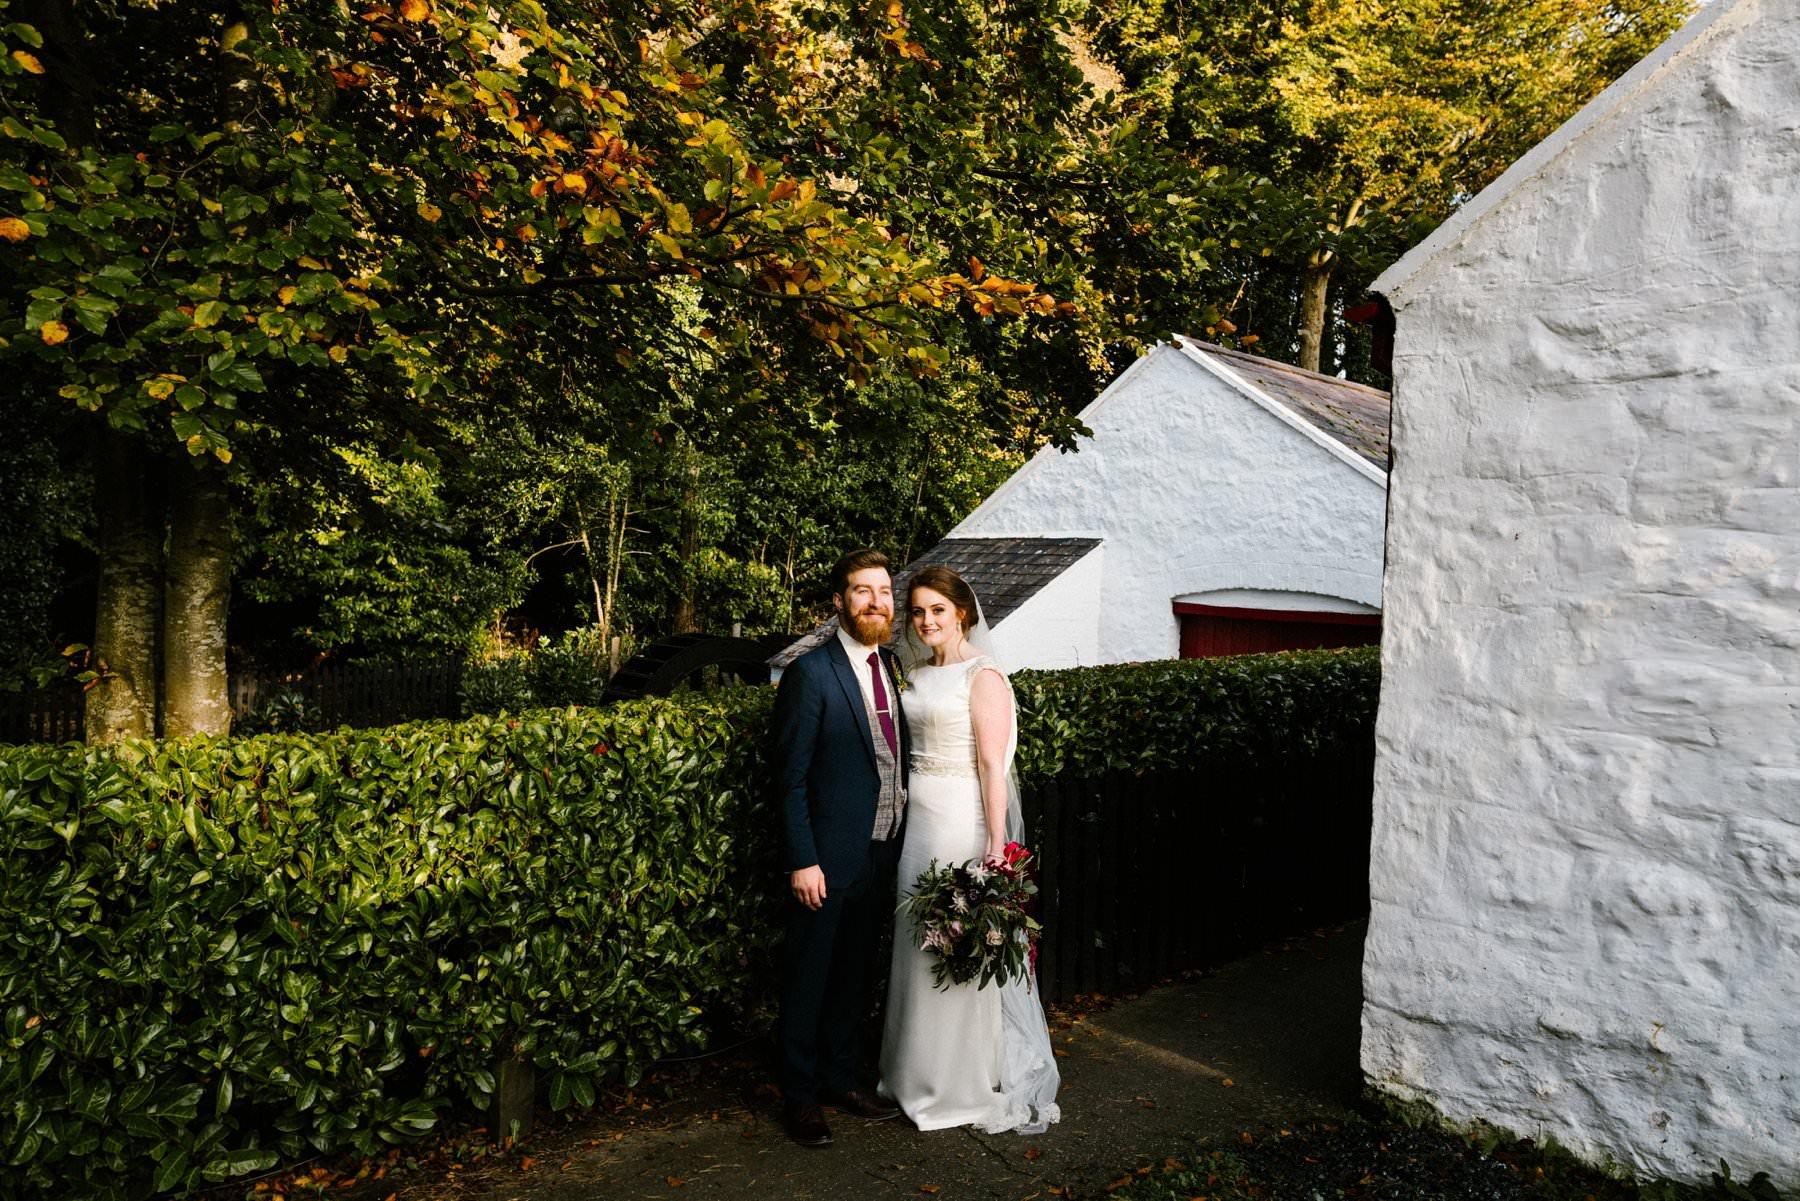 Northern Ireland Wedding Photography  Aaron and Kathryn